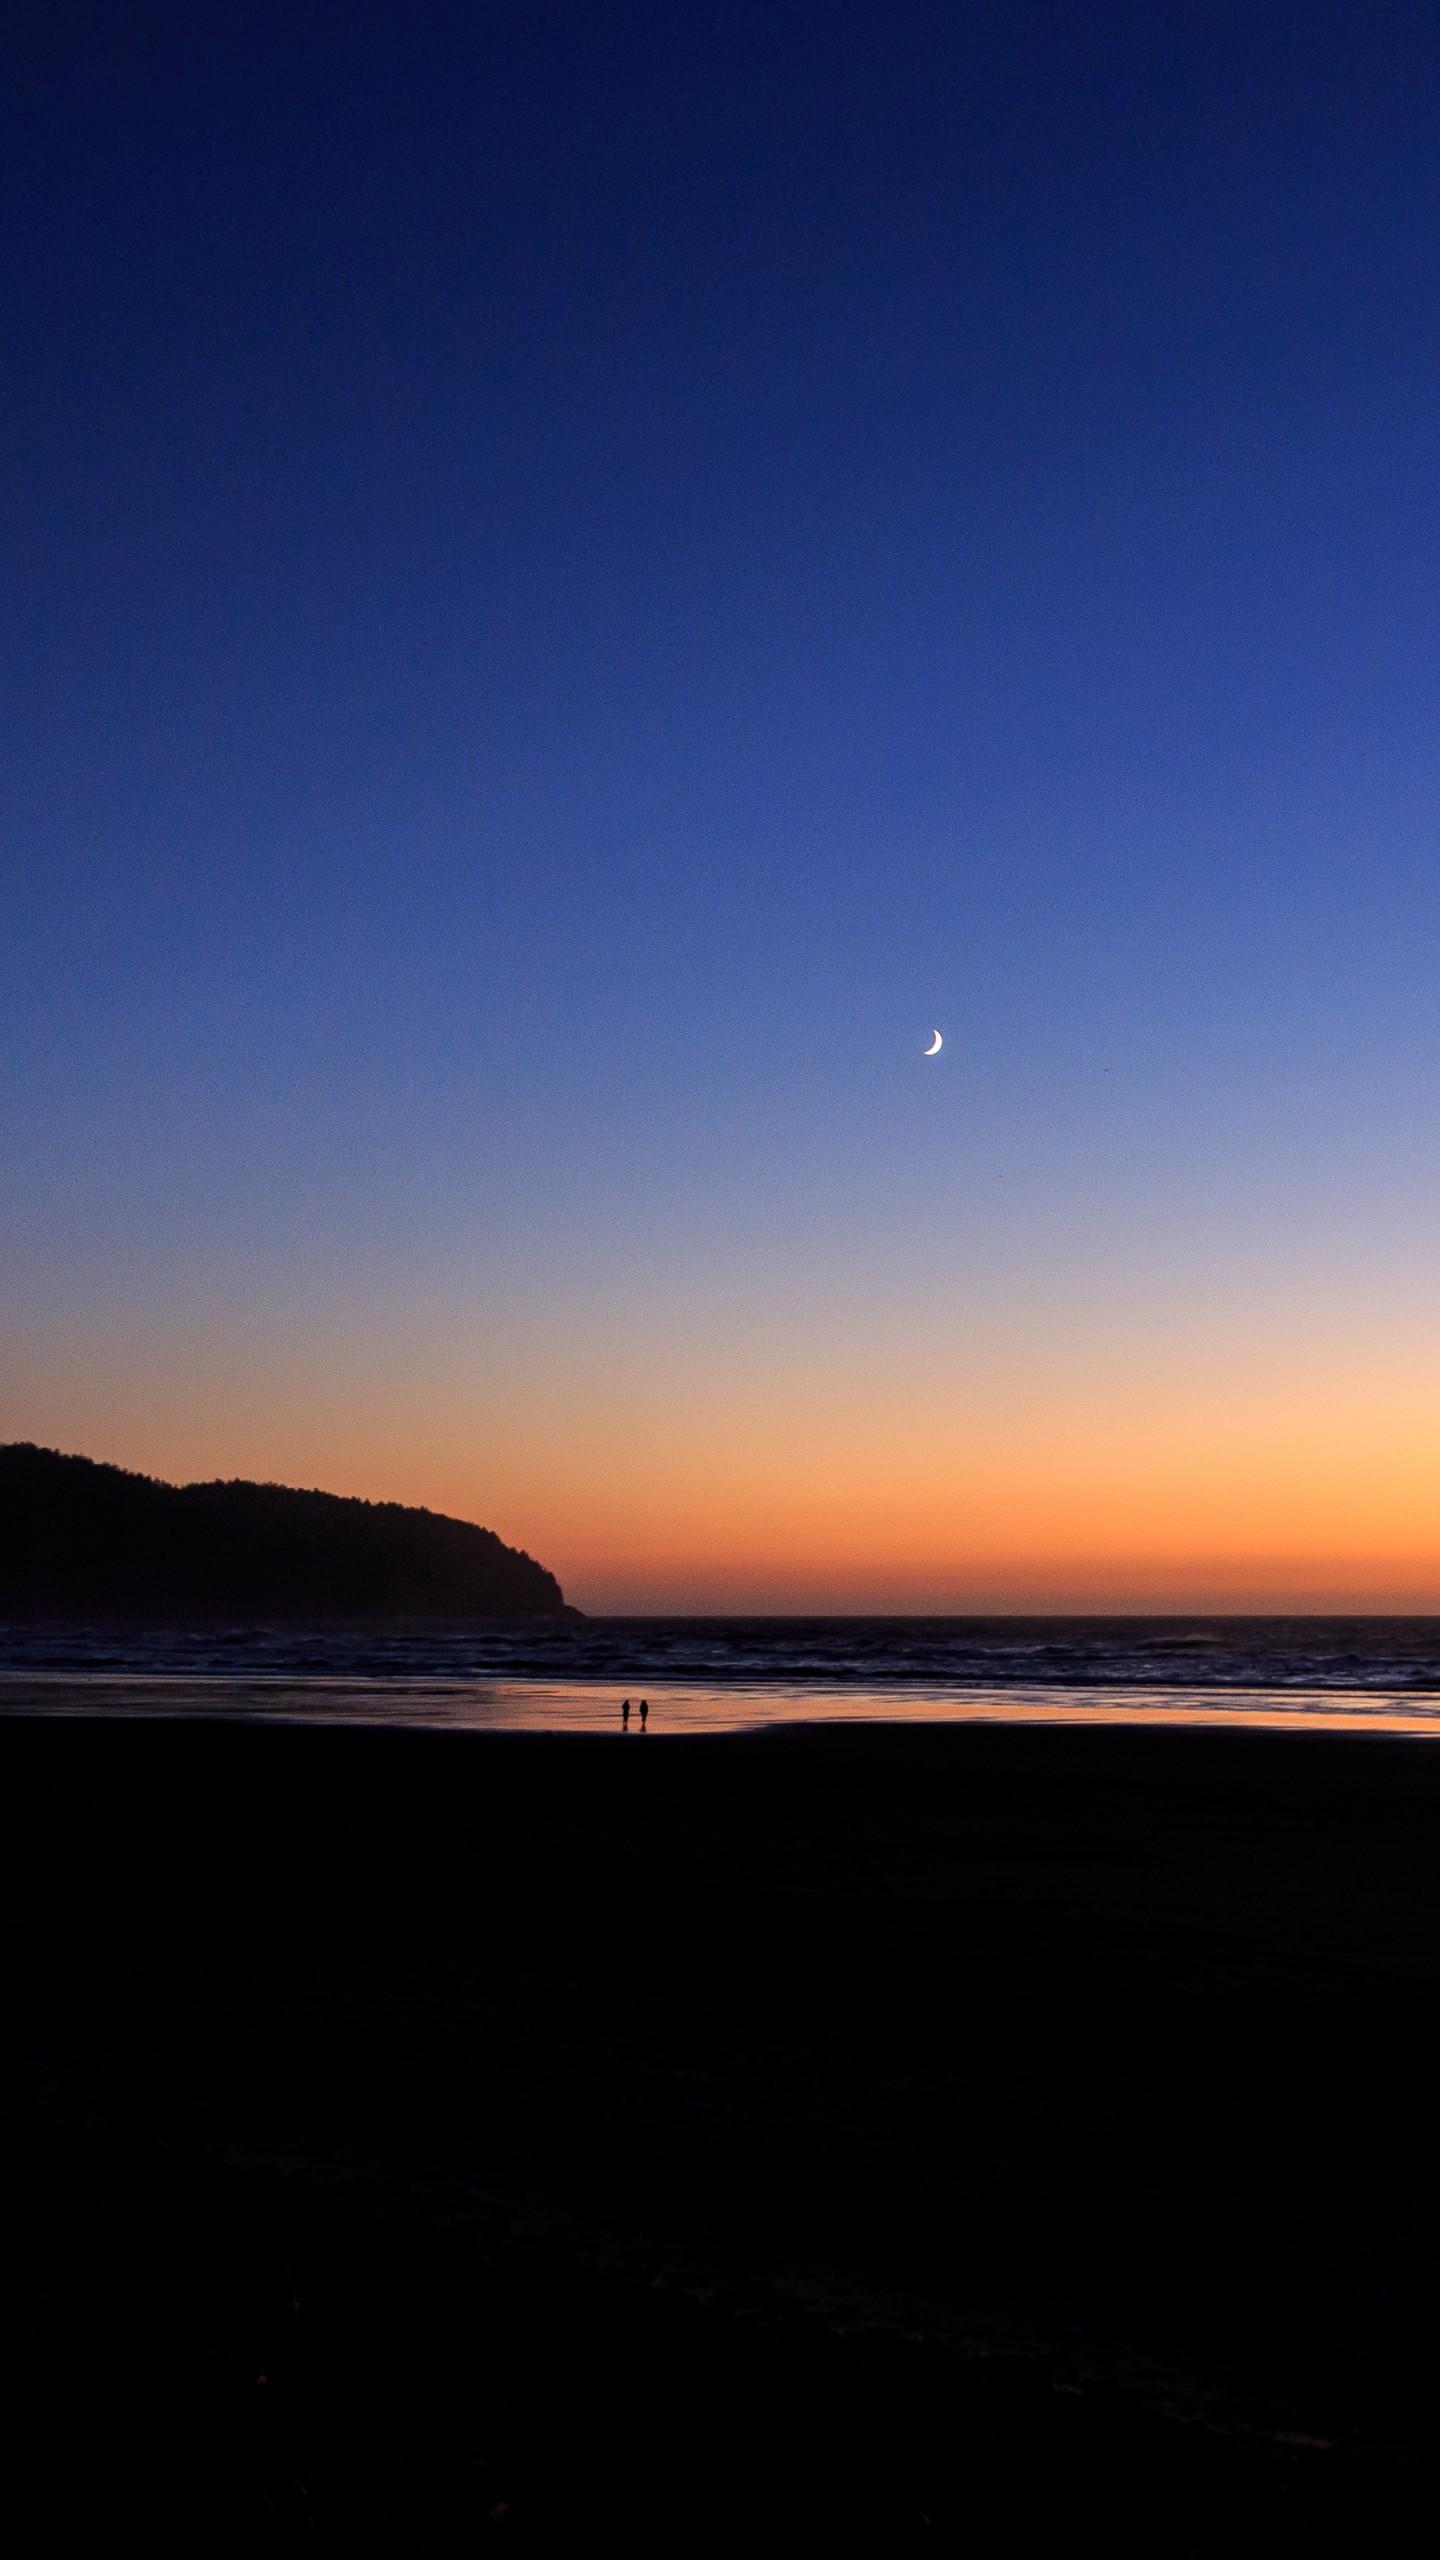 عکس زمینه افق غروب آفتاب در ساحل دریا تاریک پس زمینه